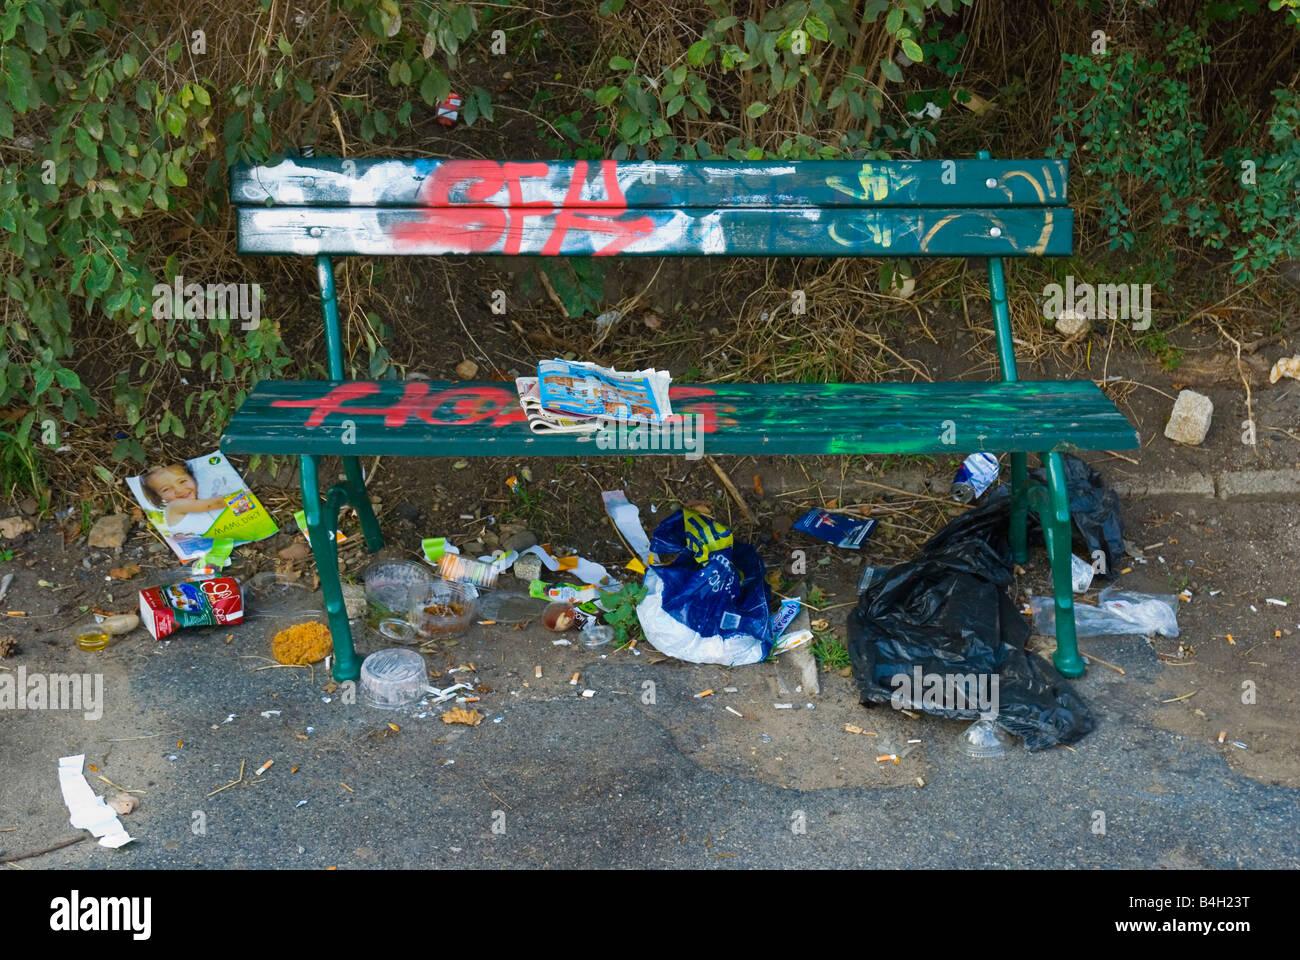 Mess in Letenske sady park in Prague Czech Republic Europe - Stock Image